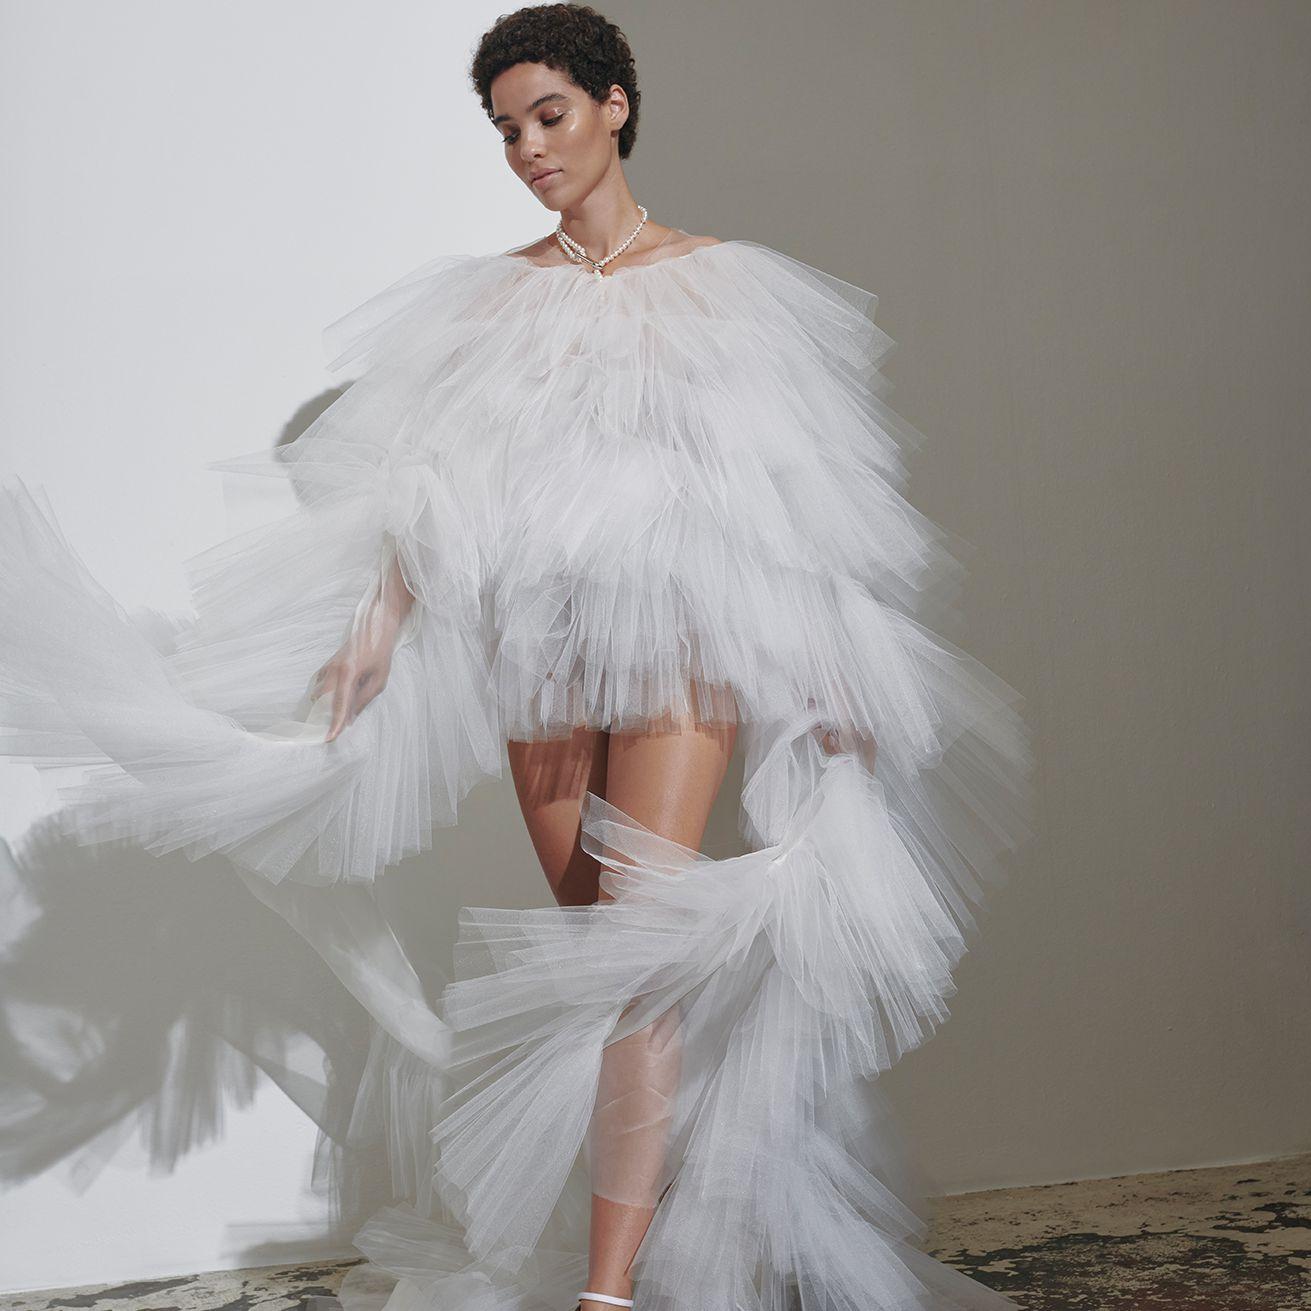 Cloud nine couture dress kaviar gauche